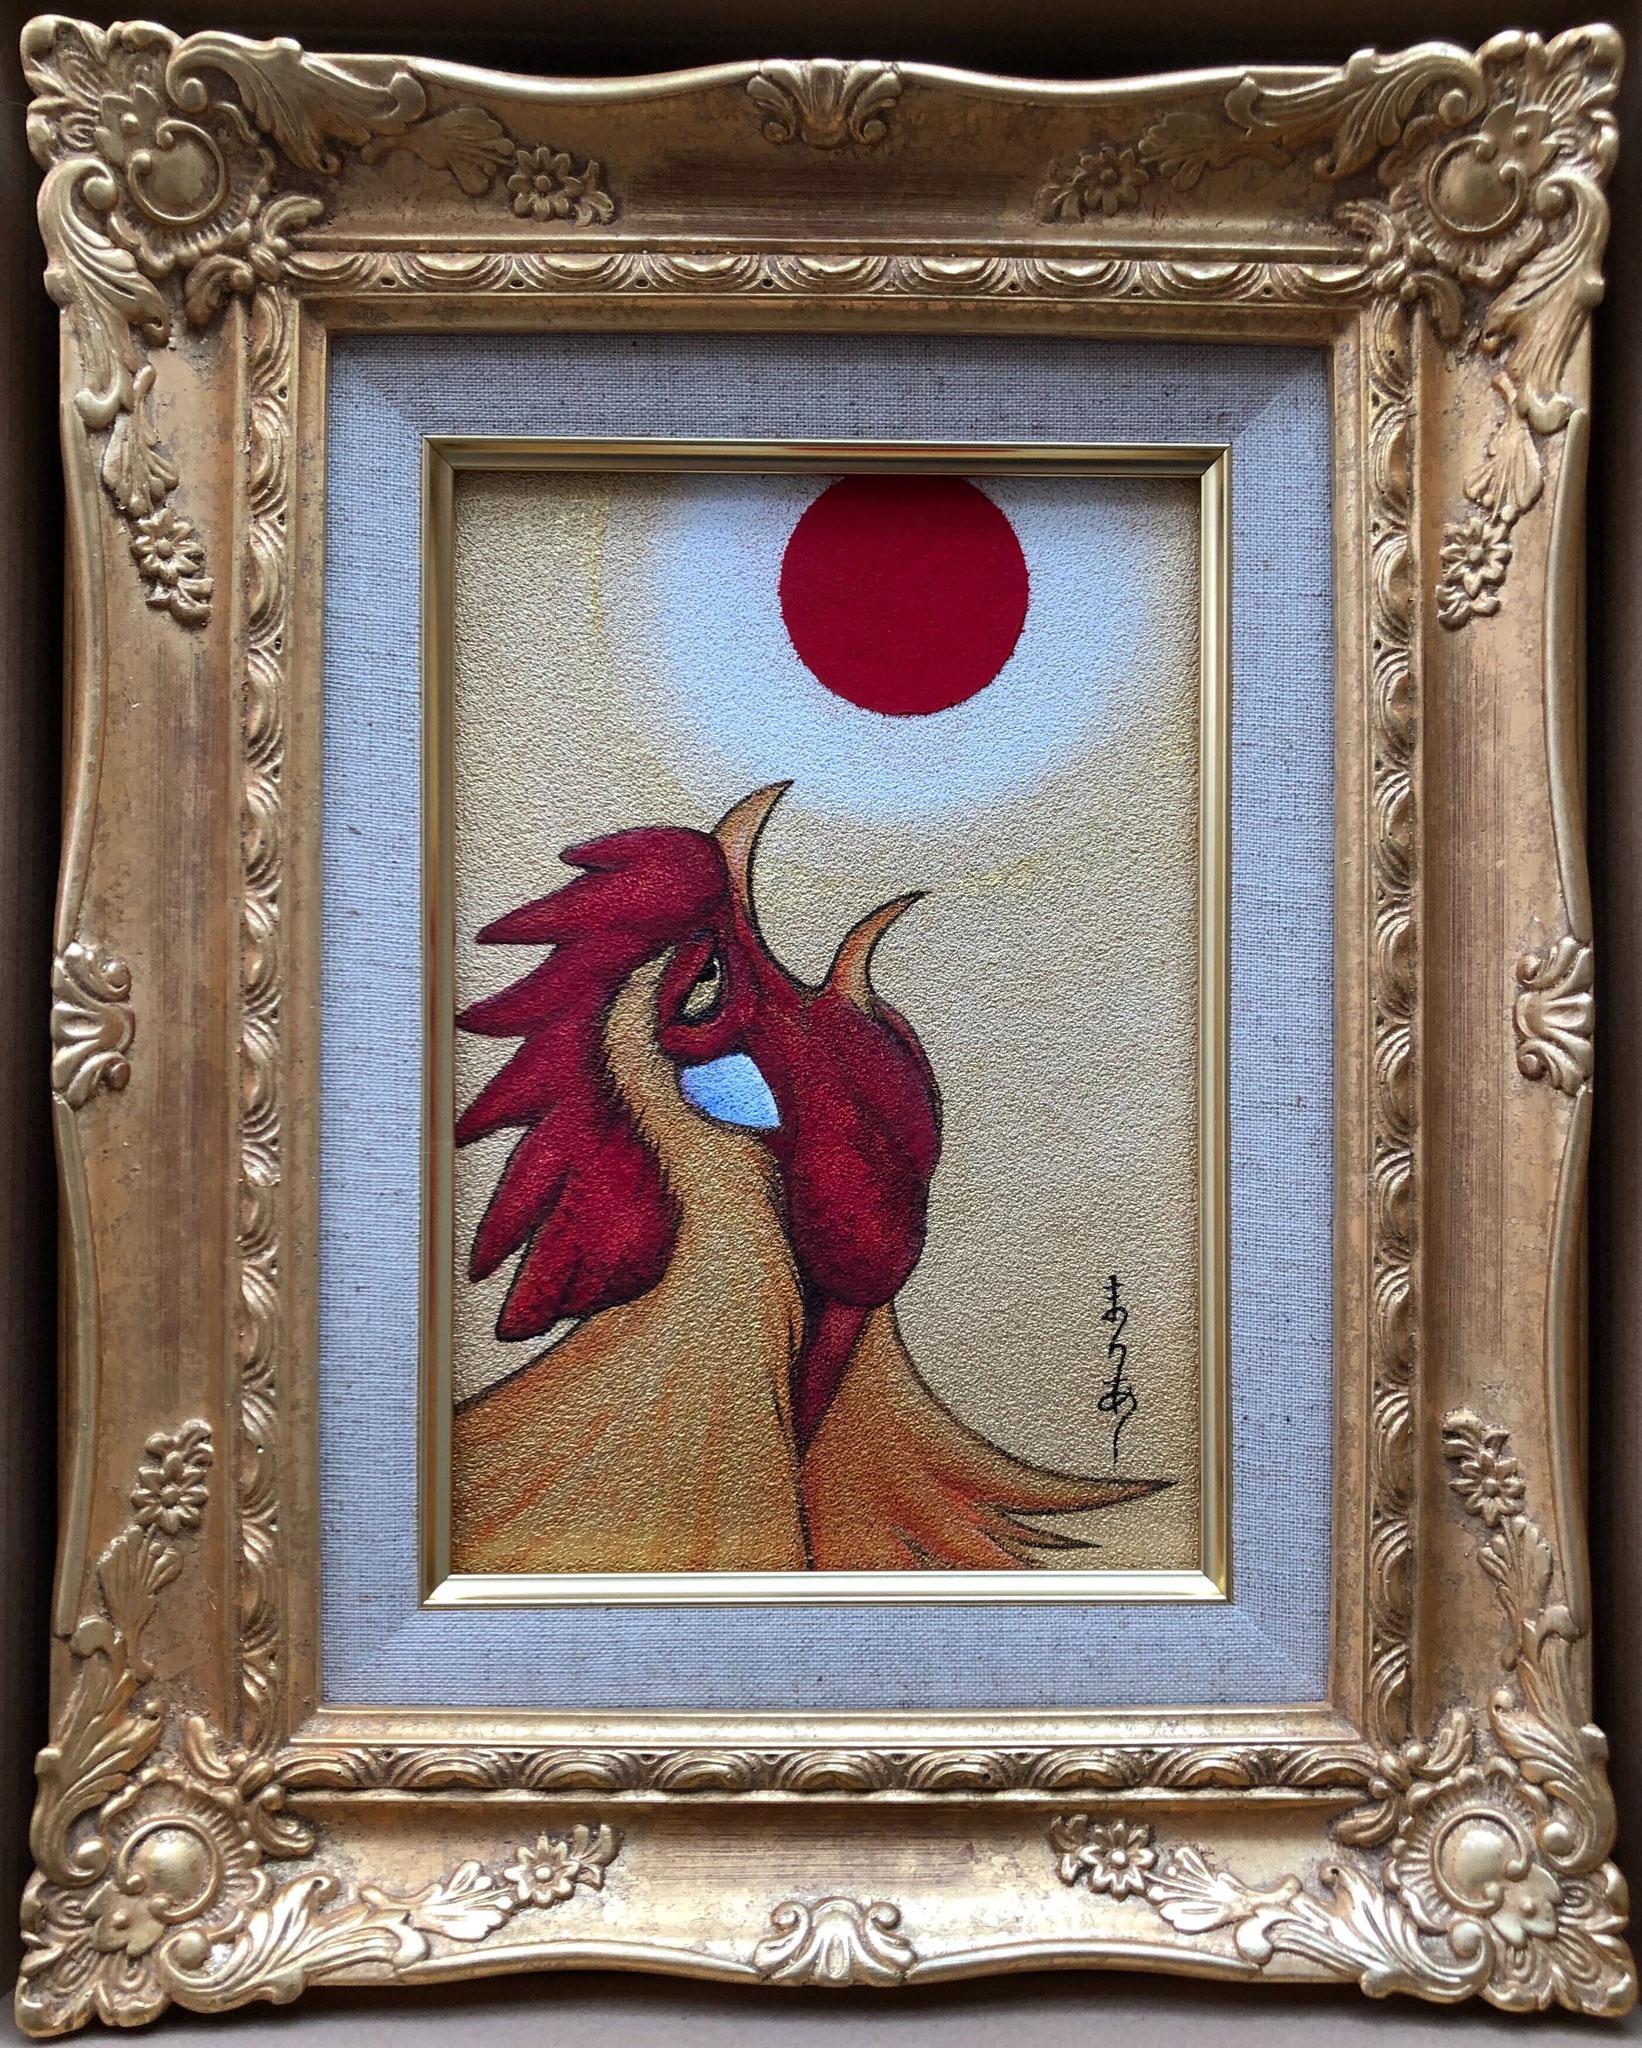 太陽の鳥Ⅰ 日本画 SM ¥110,000(税別)